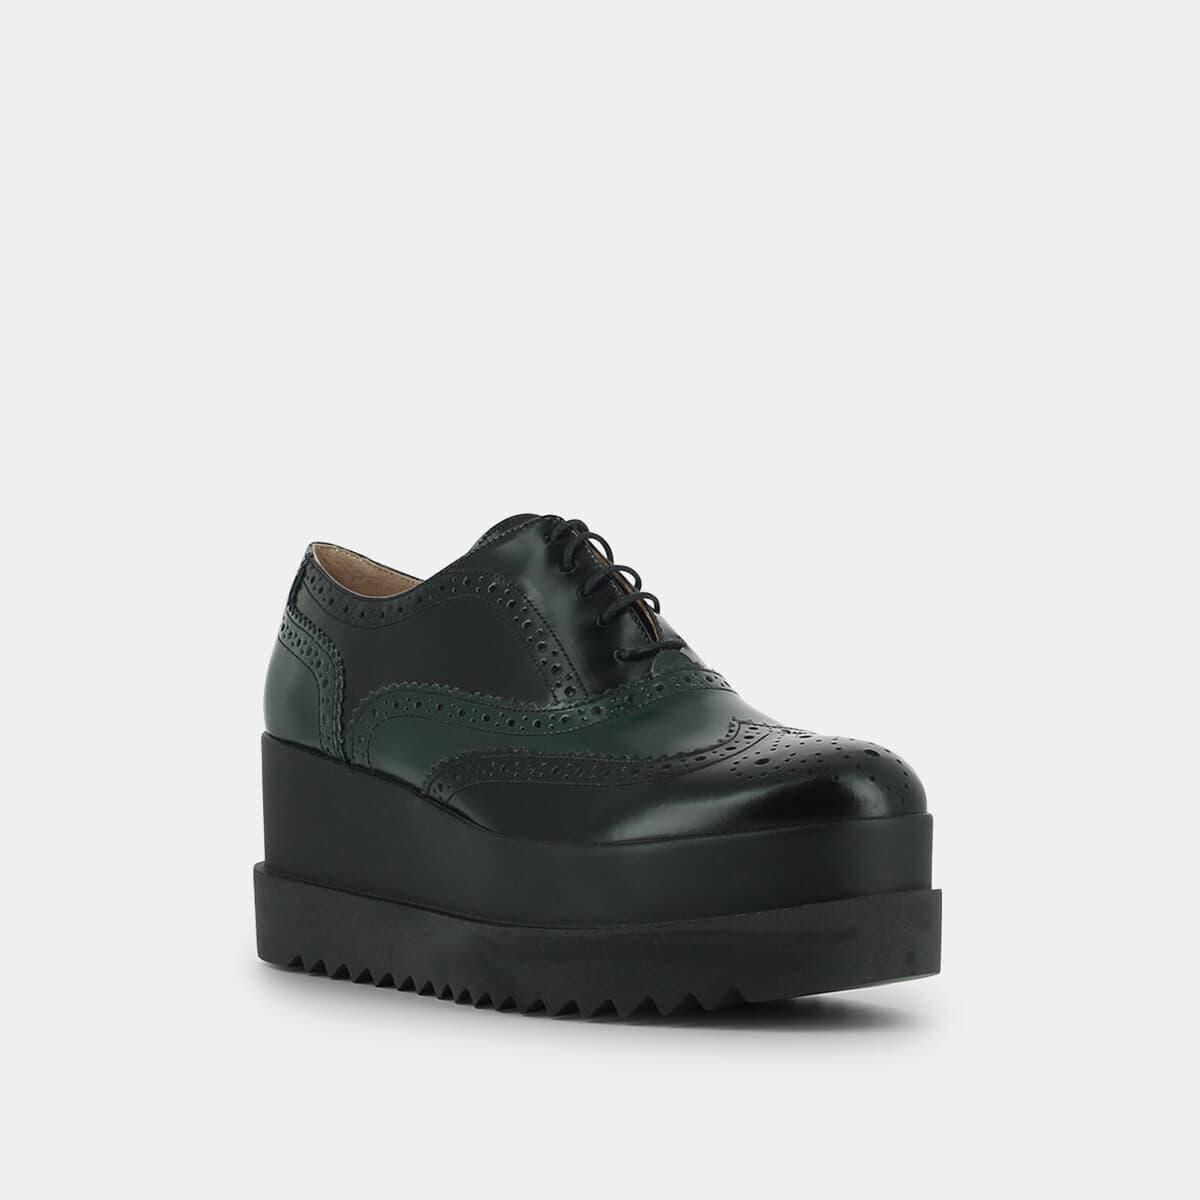 chaussure jonak derbies noire amico